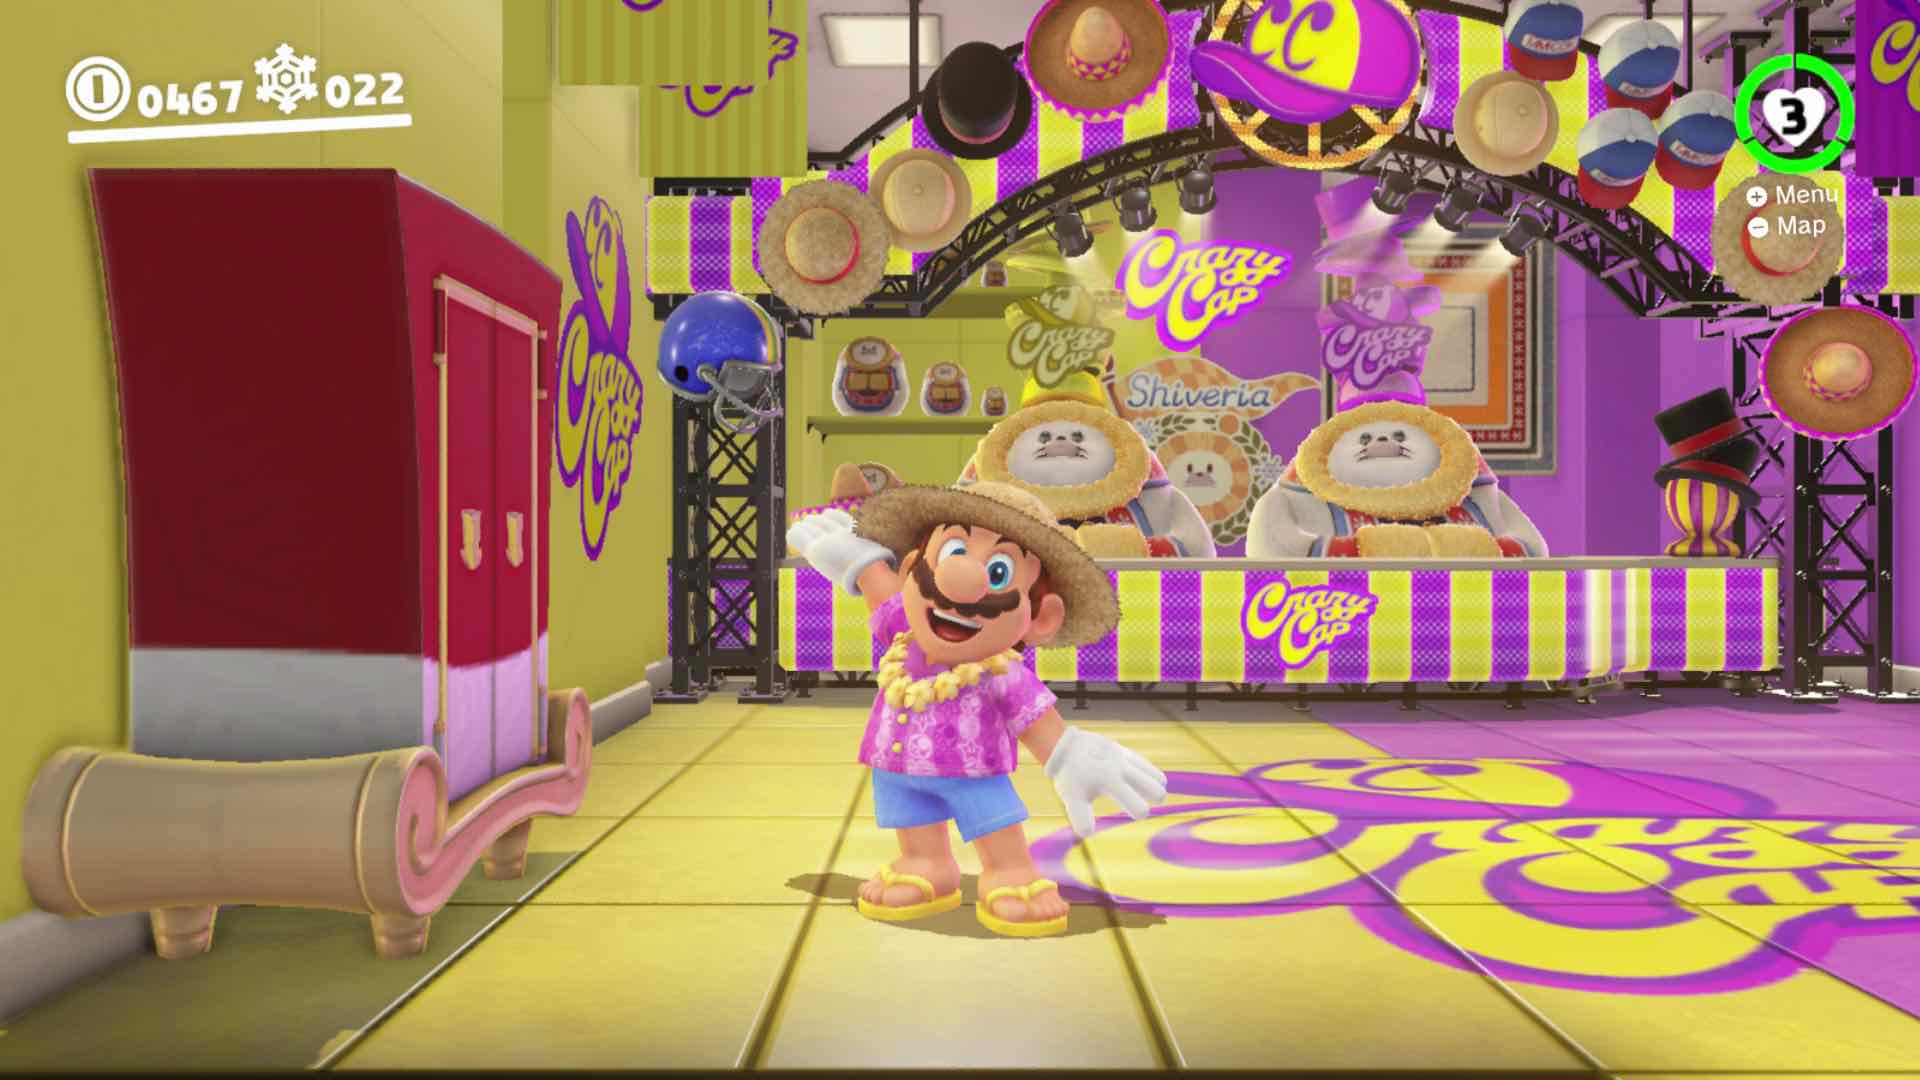 resort-outfit-super-mario-odyssey-screenshot